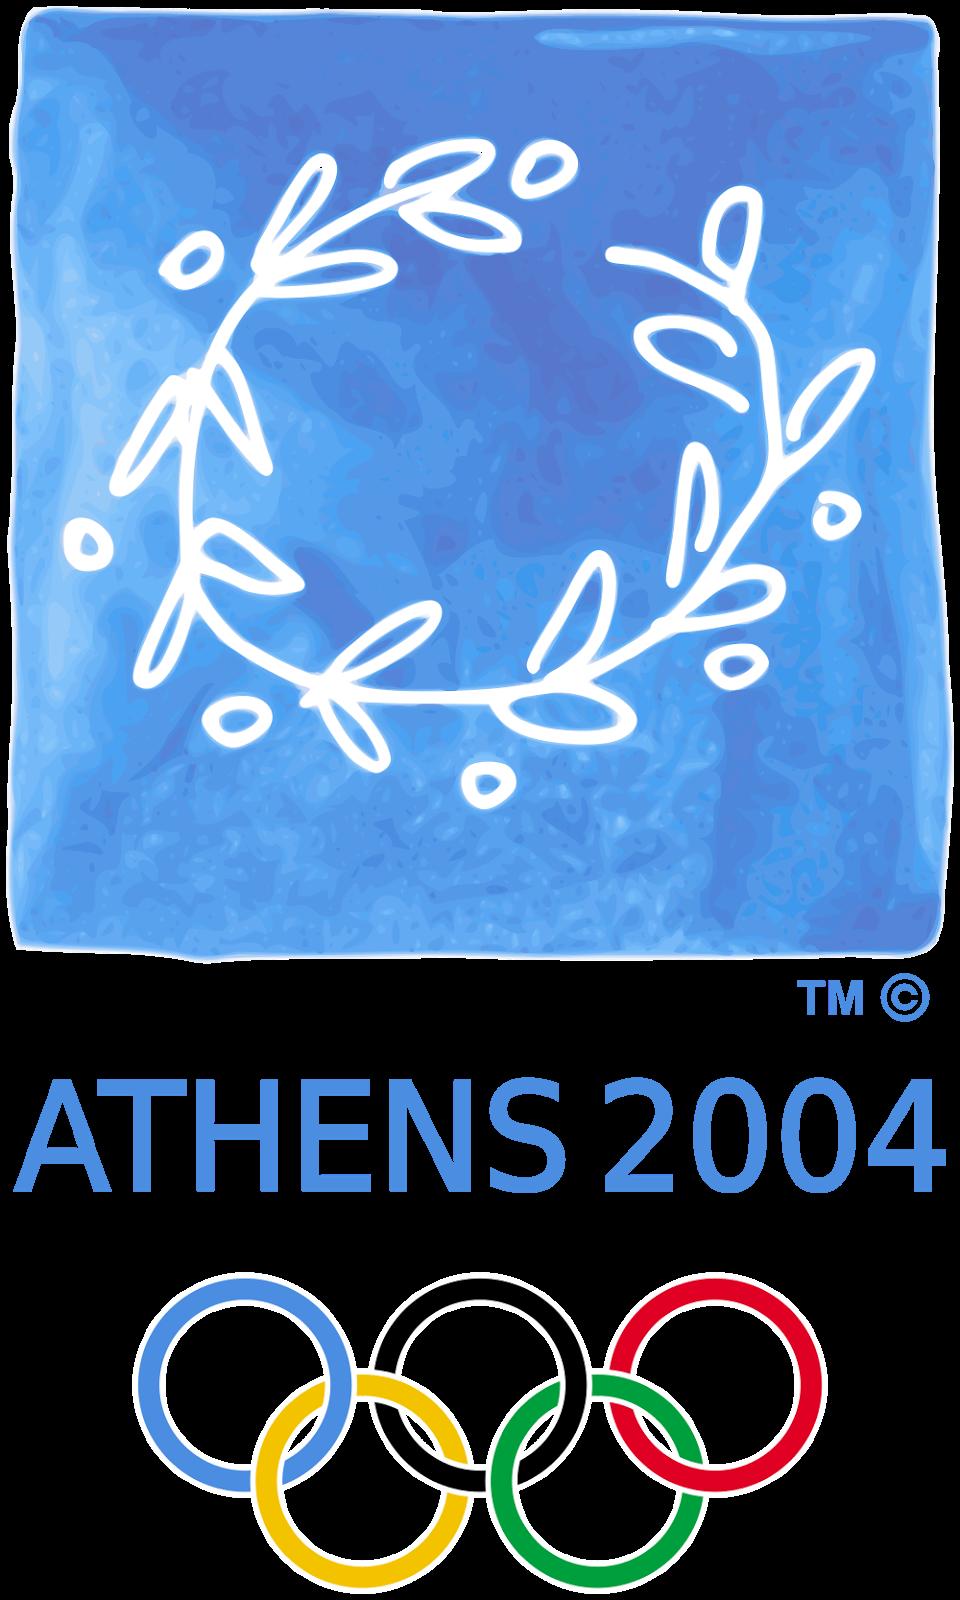 Olympic rings logo rio 2016 olympics logo designed by fred gelli - Athens 2000 Olympic Logo